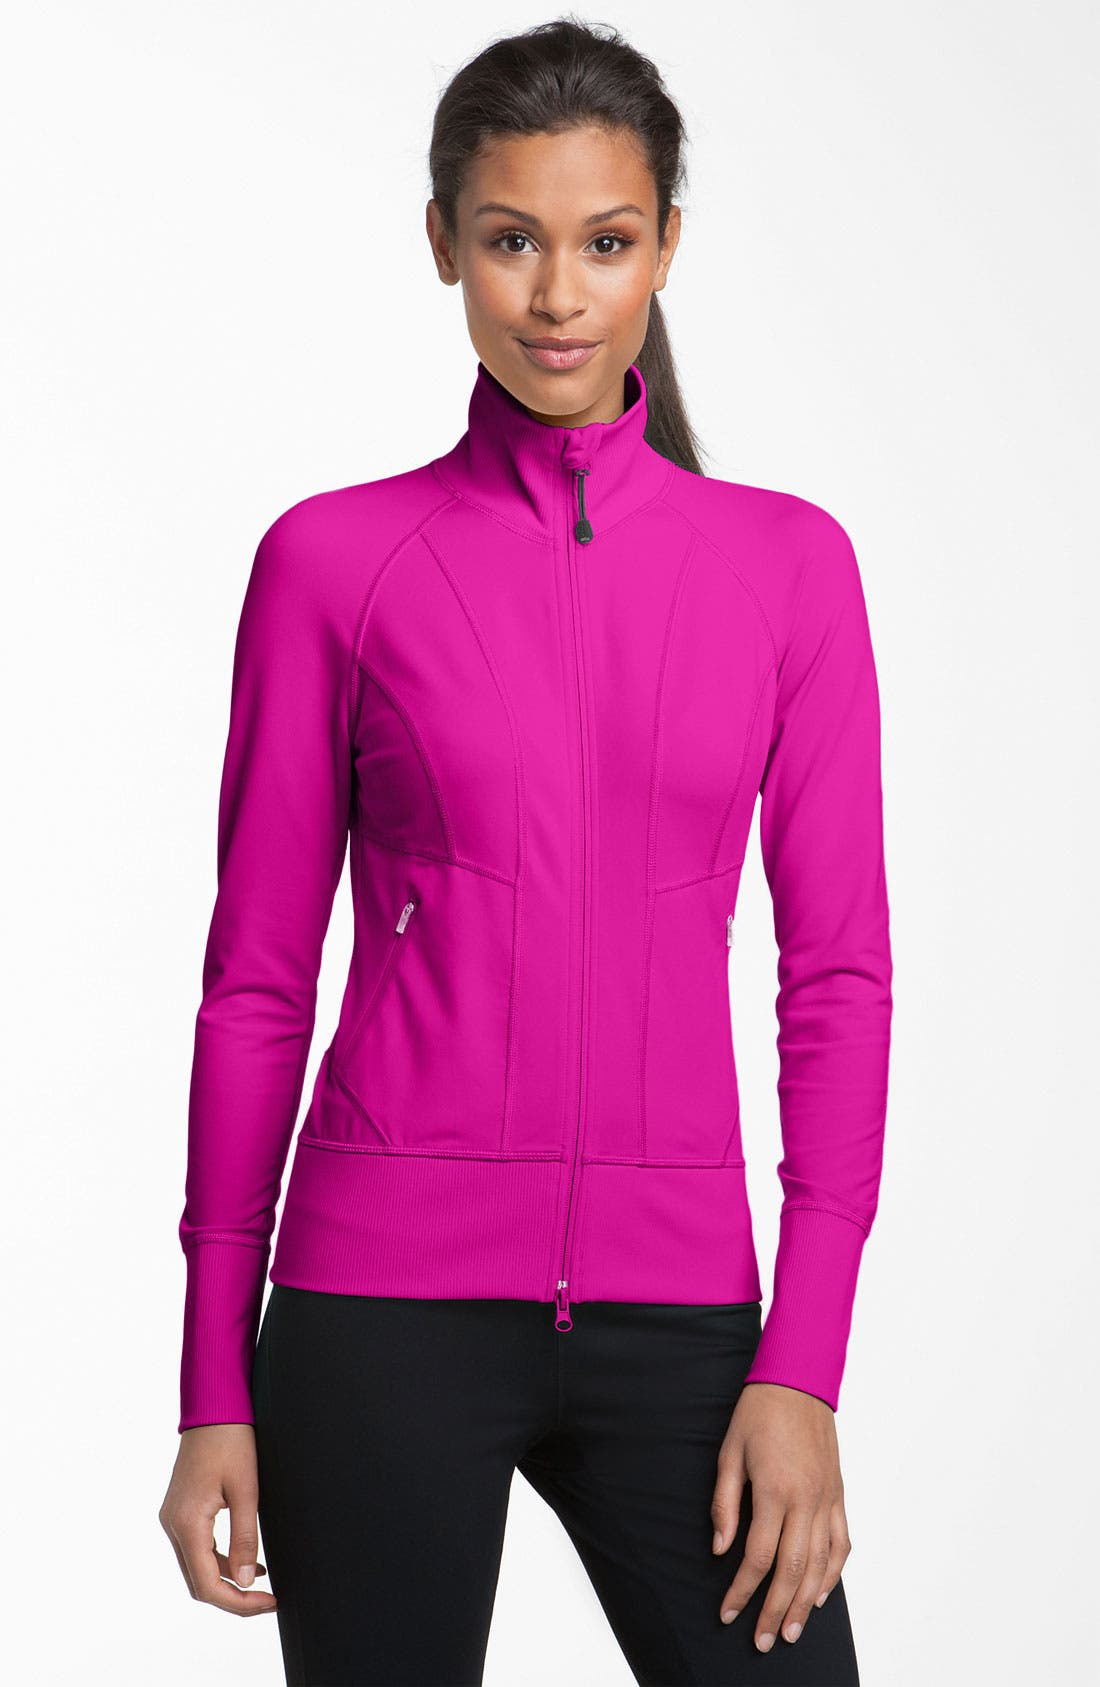 Alternate Image 1 Selected - Zella 'No. 1 Sport'  Jacket